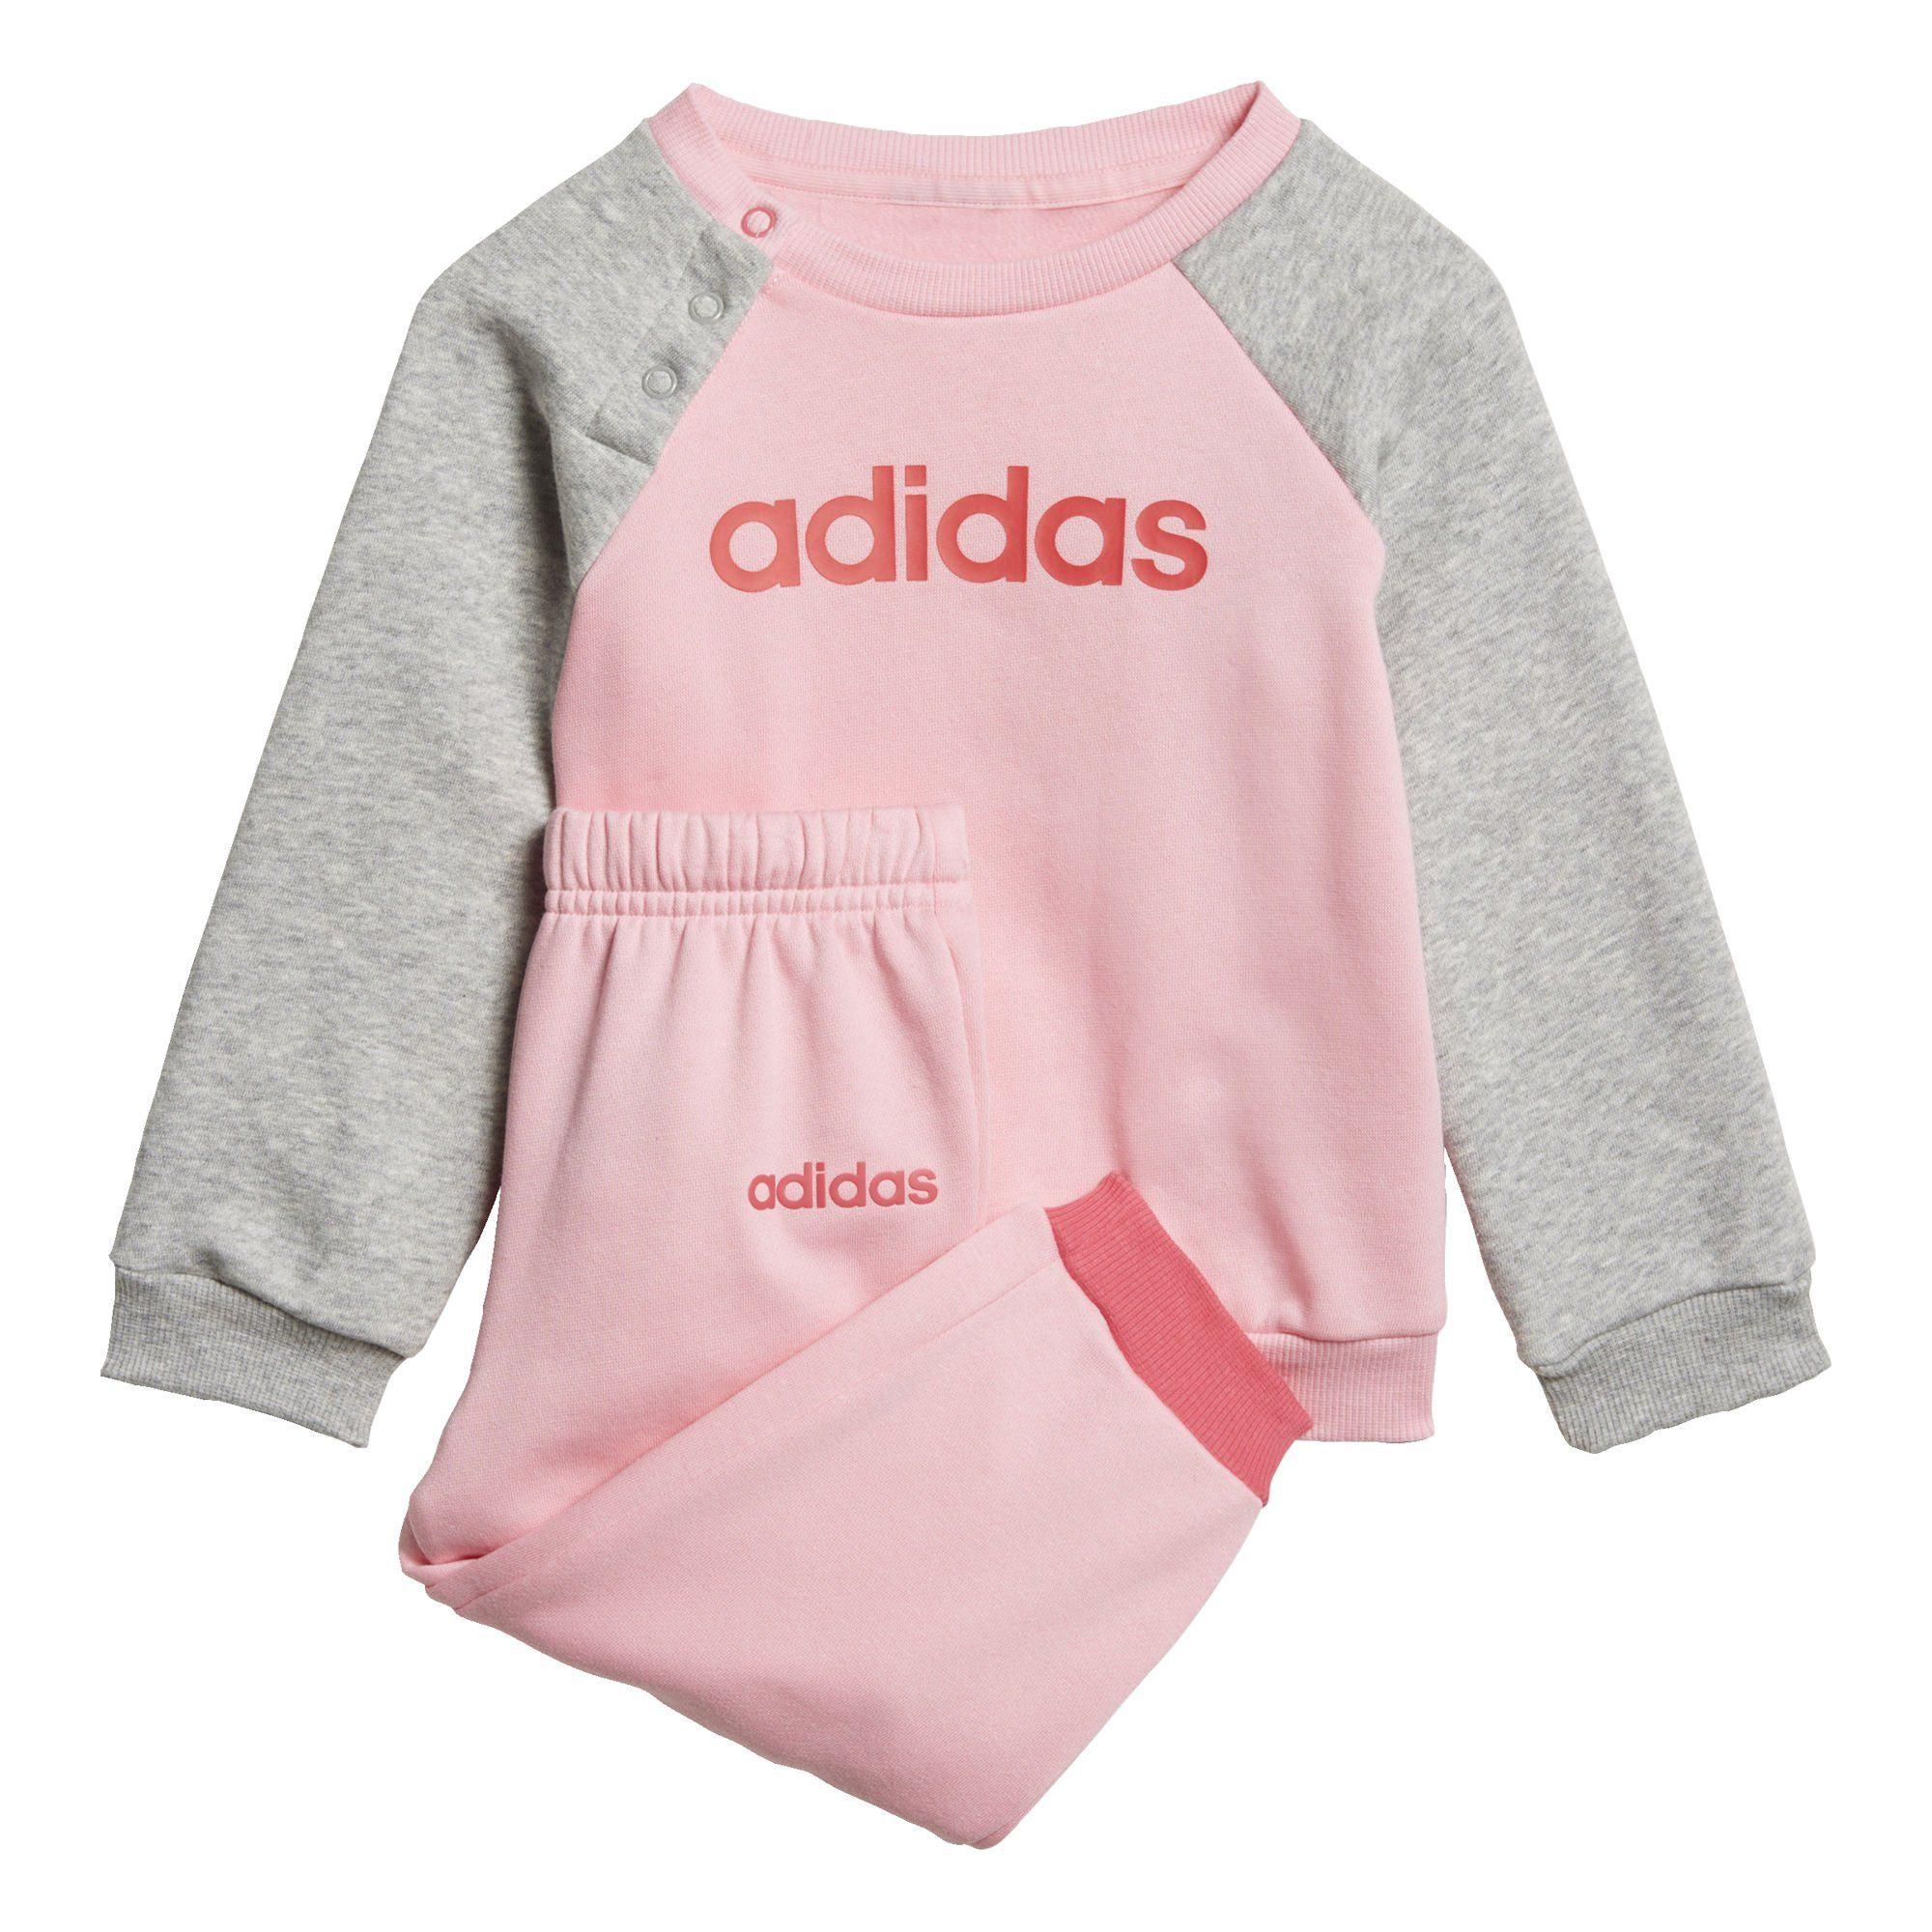 adidas Performance Trainingsanzug »Linear Fleece Jogginganzug«, Essentials online kaufen | OTTO